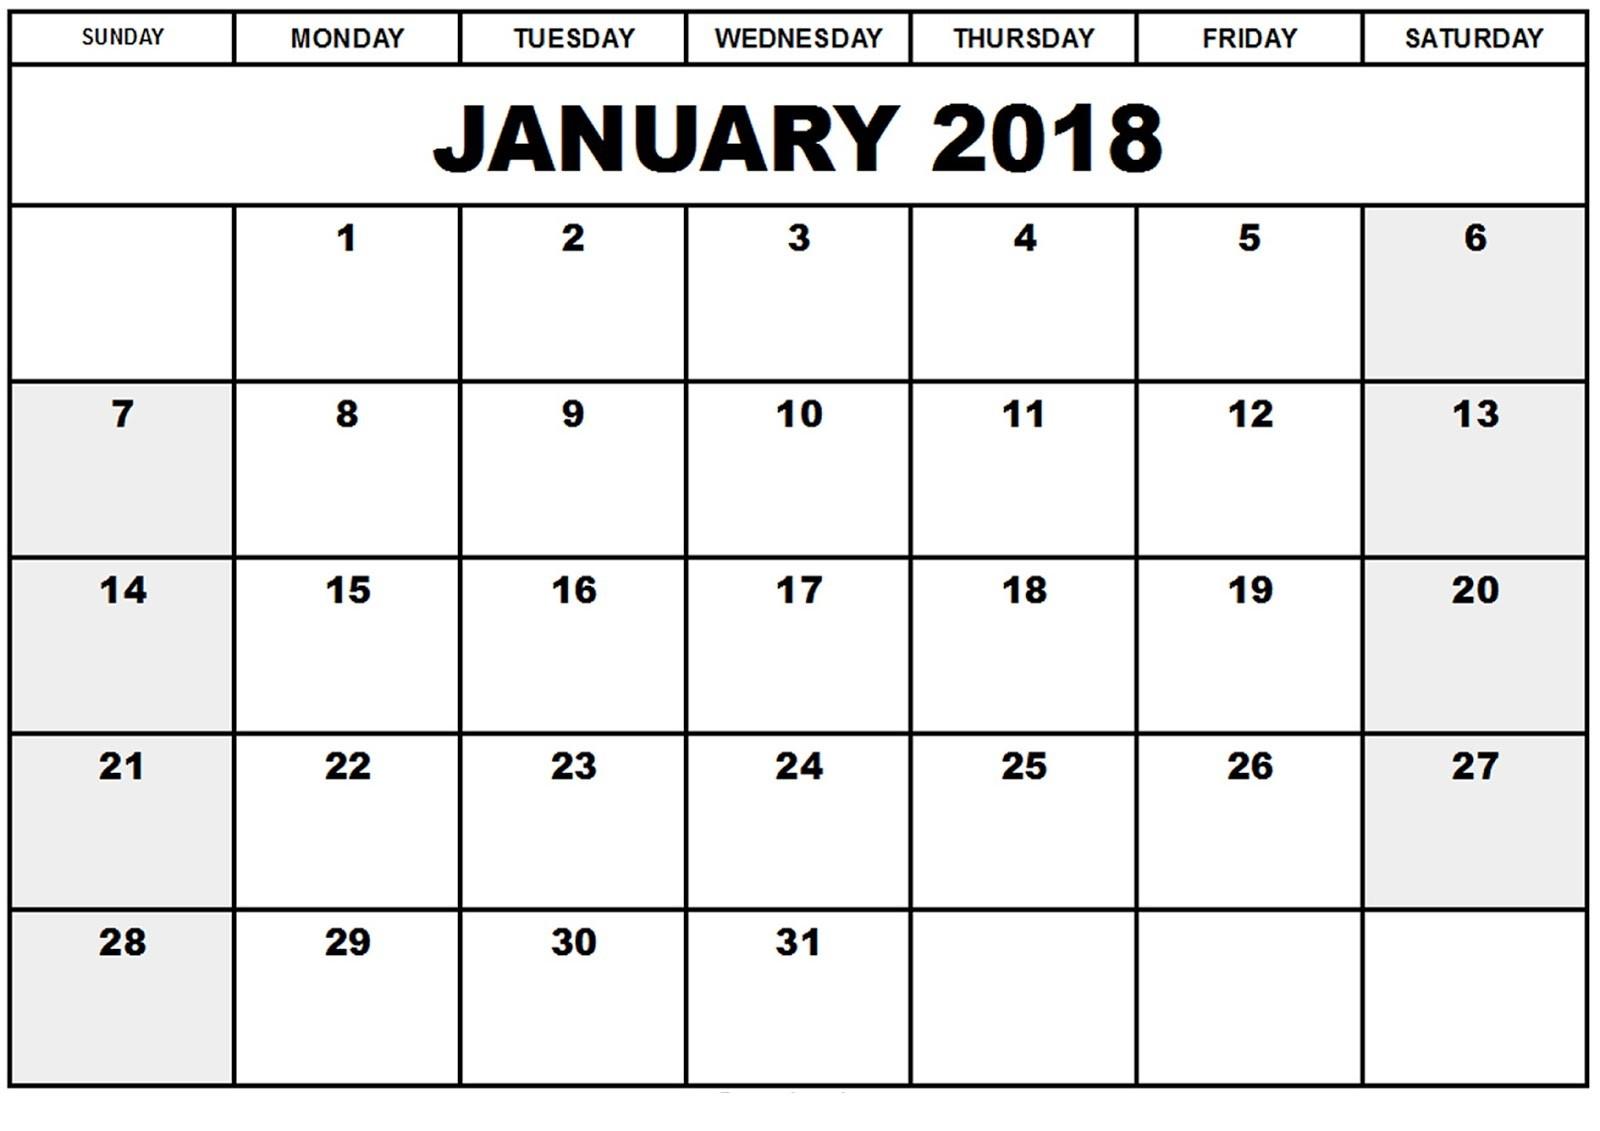 Free Printable Calendar Template Printable Calendar 2018 [free] January 2018 Printable